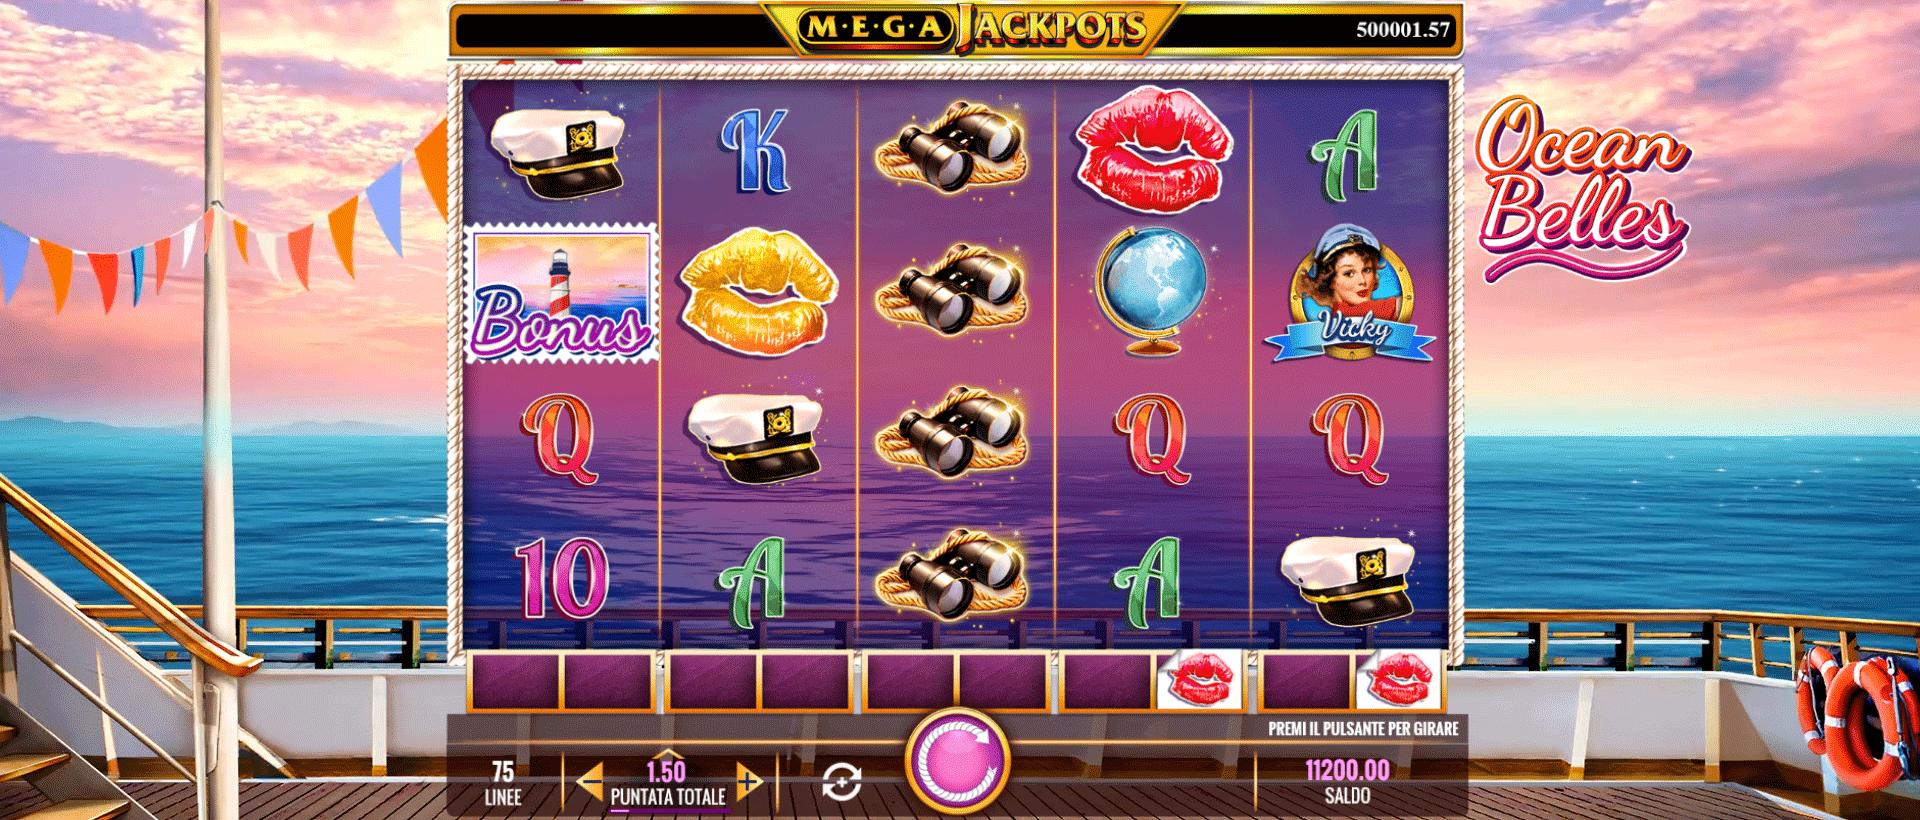 Slot Megajackpots Ocean Belles